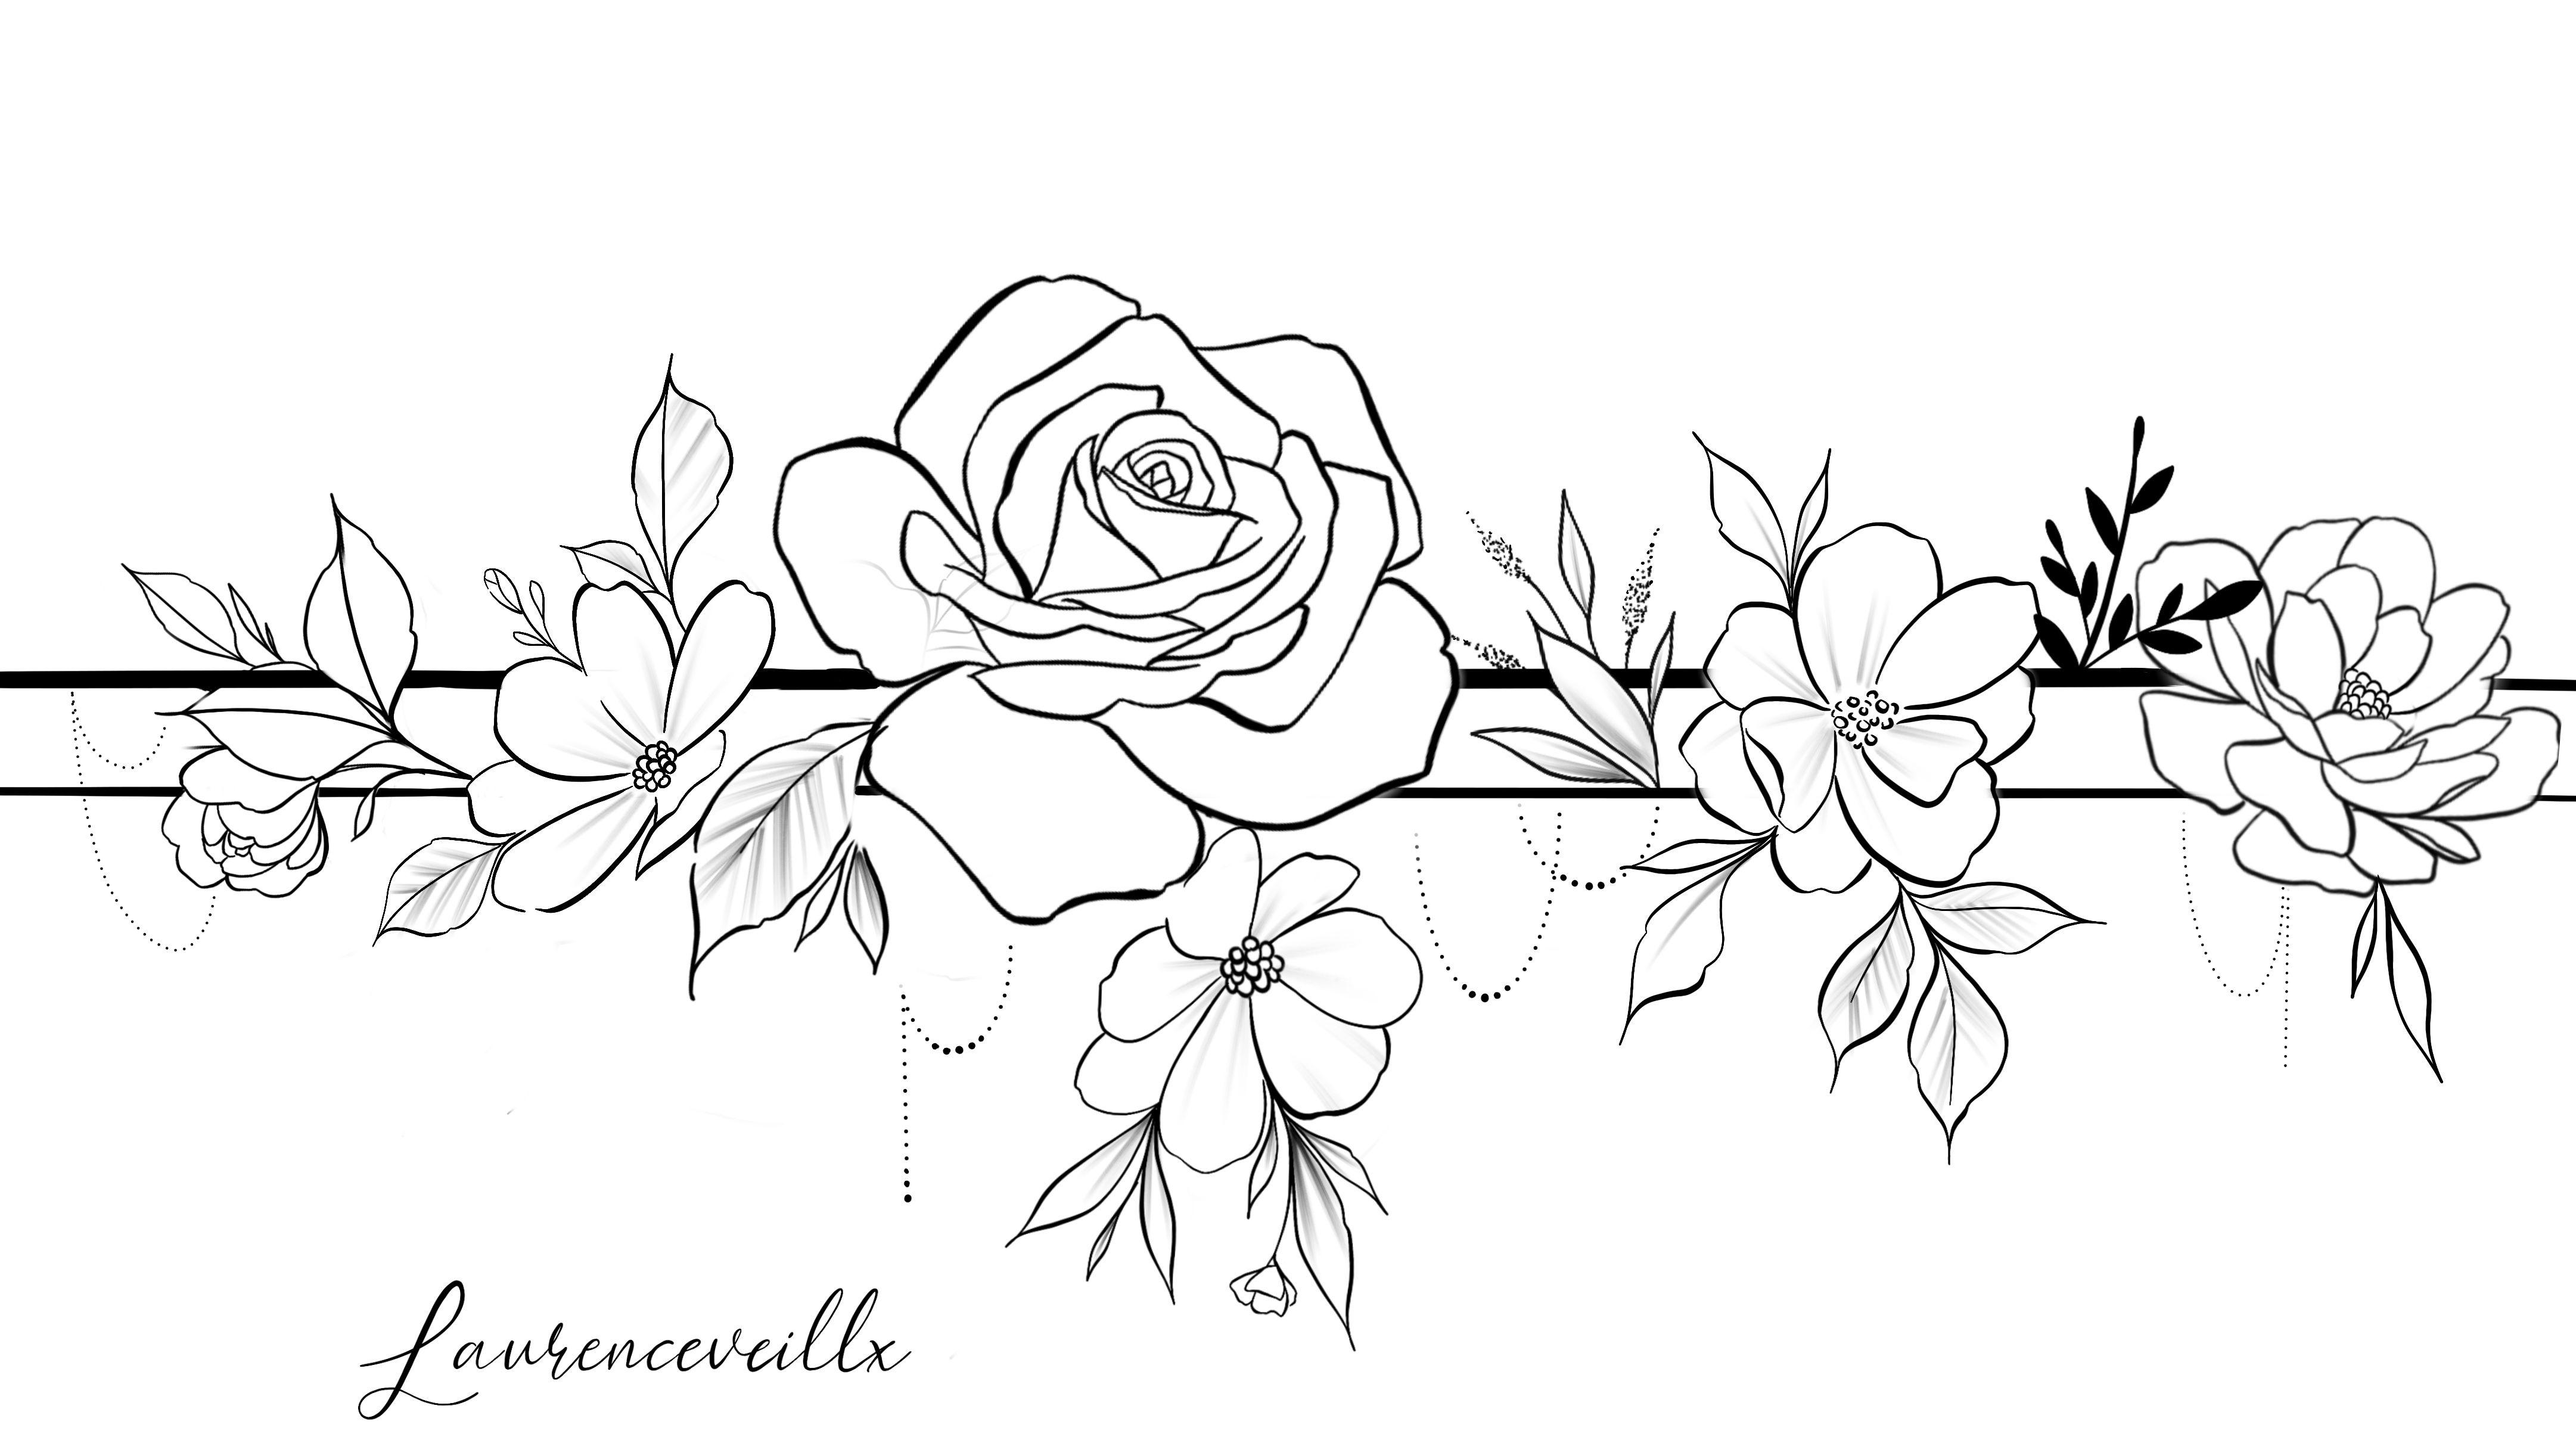 Photo of Rose Flower Bracelet Chain Tattoo Design @laurenceveillx